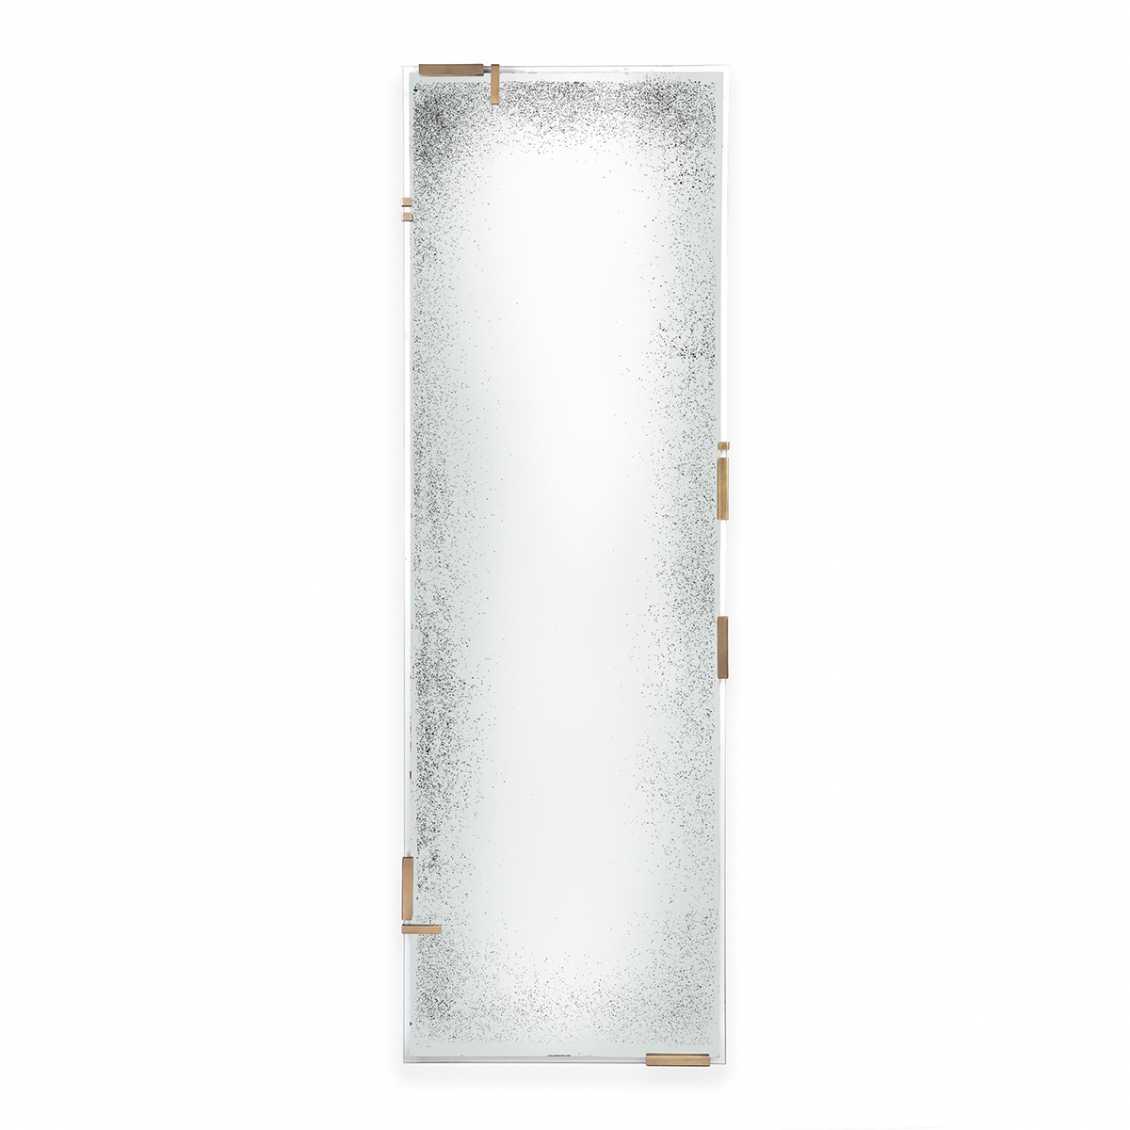 Ethnicraft Clear Frameless Medium Floor spiegel